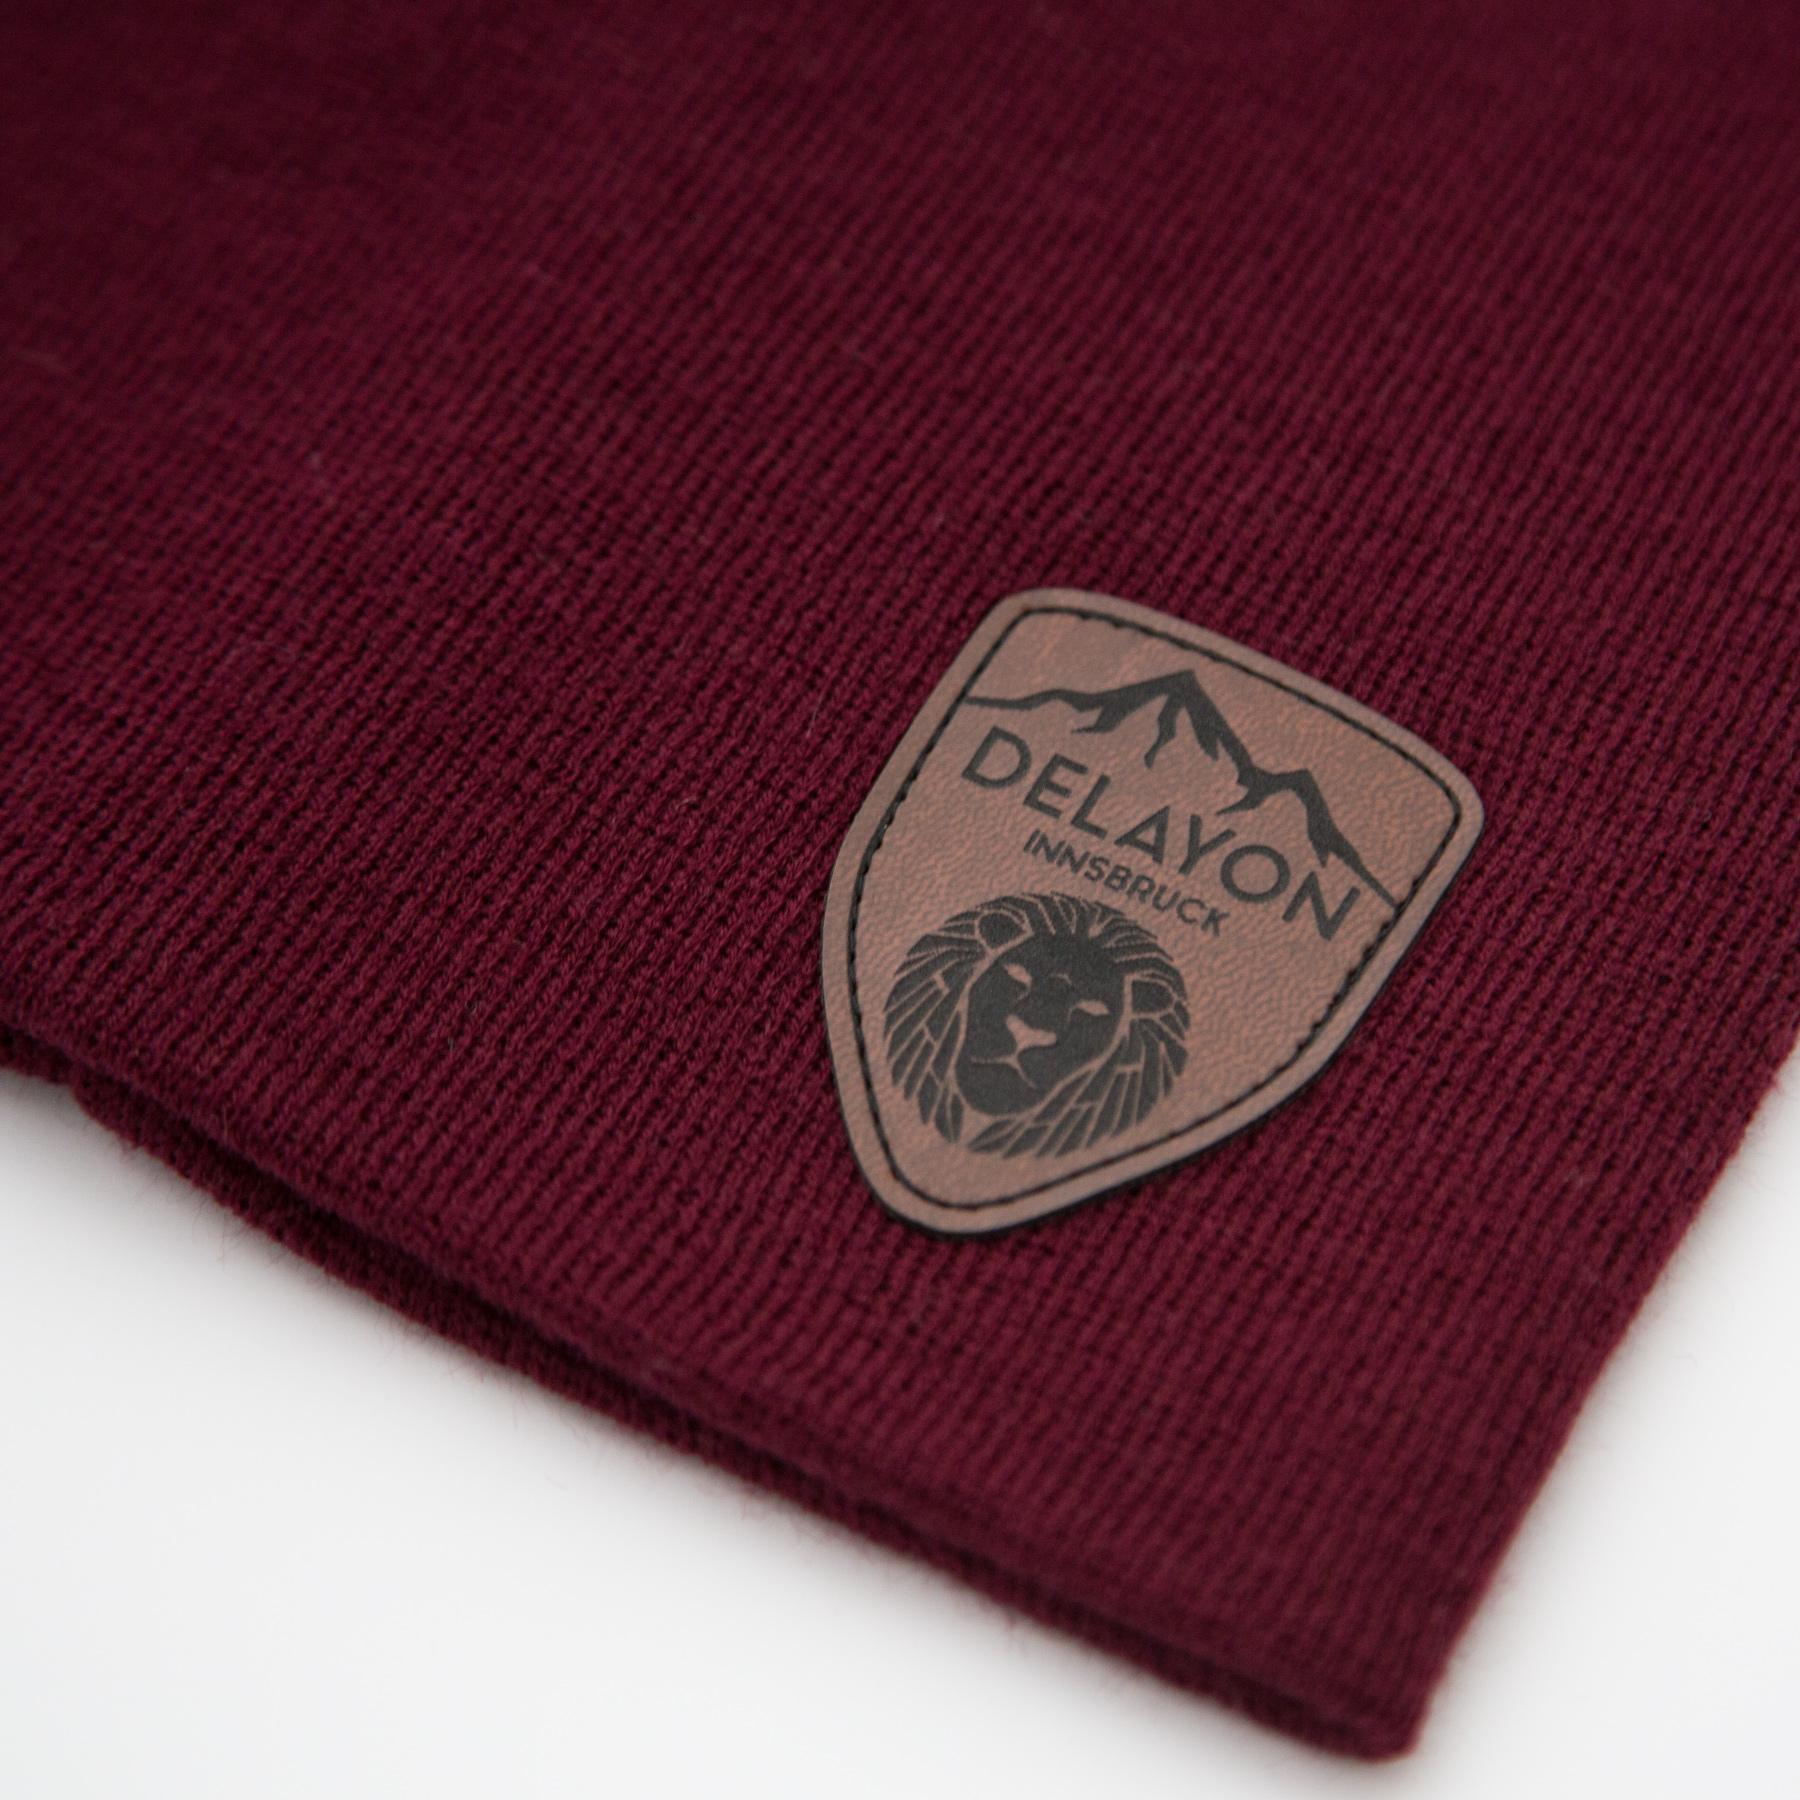 DELAYON Eyewear Innsbruck Beanie Bordeaux